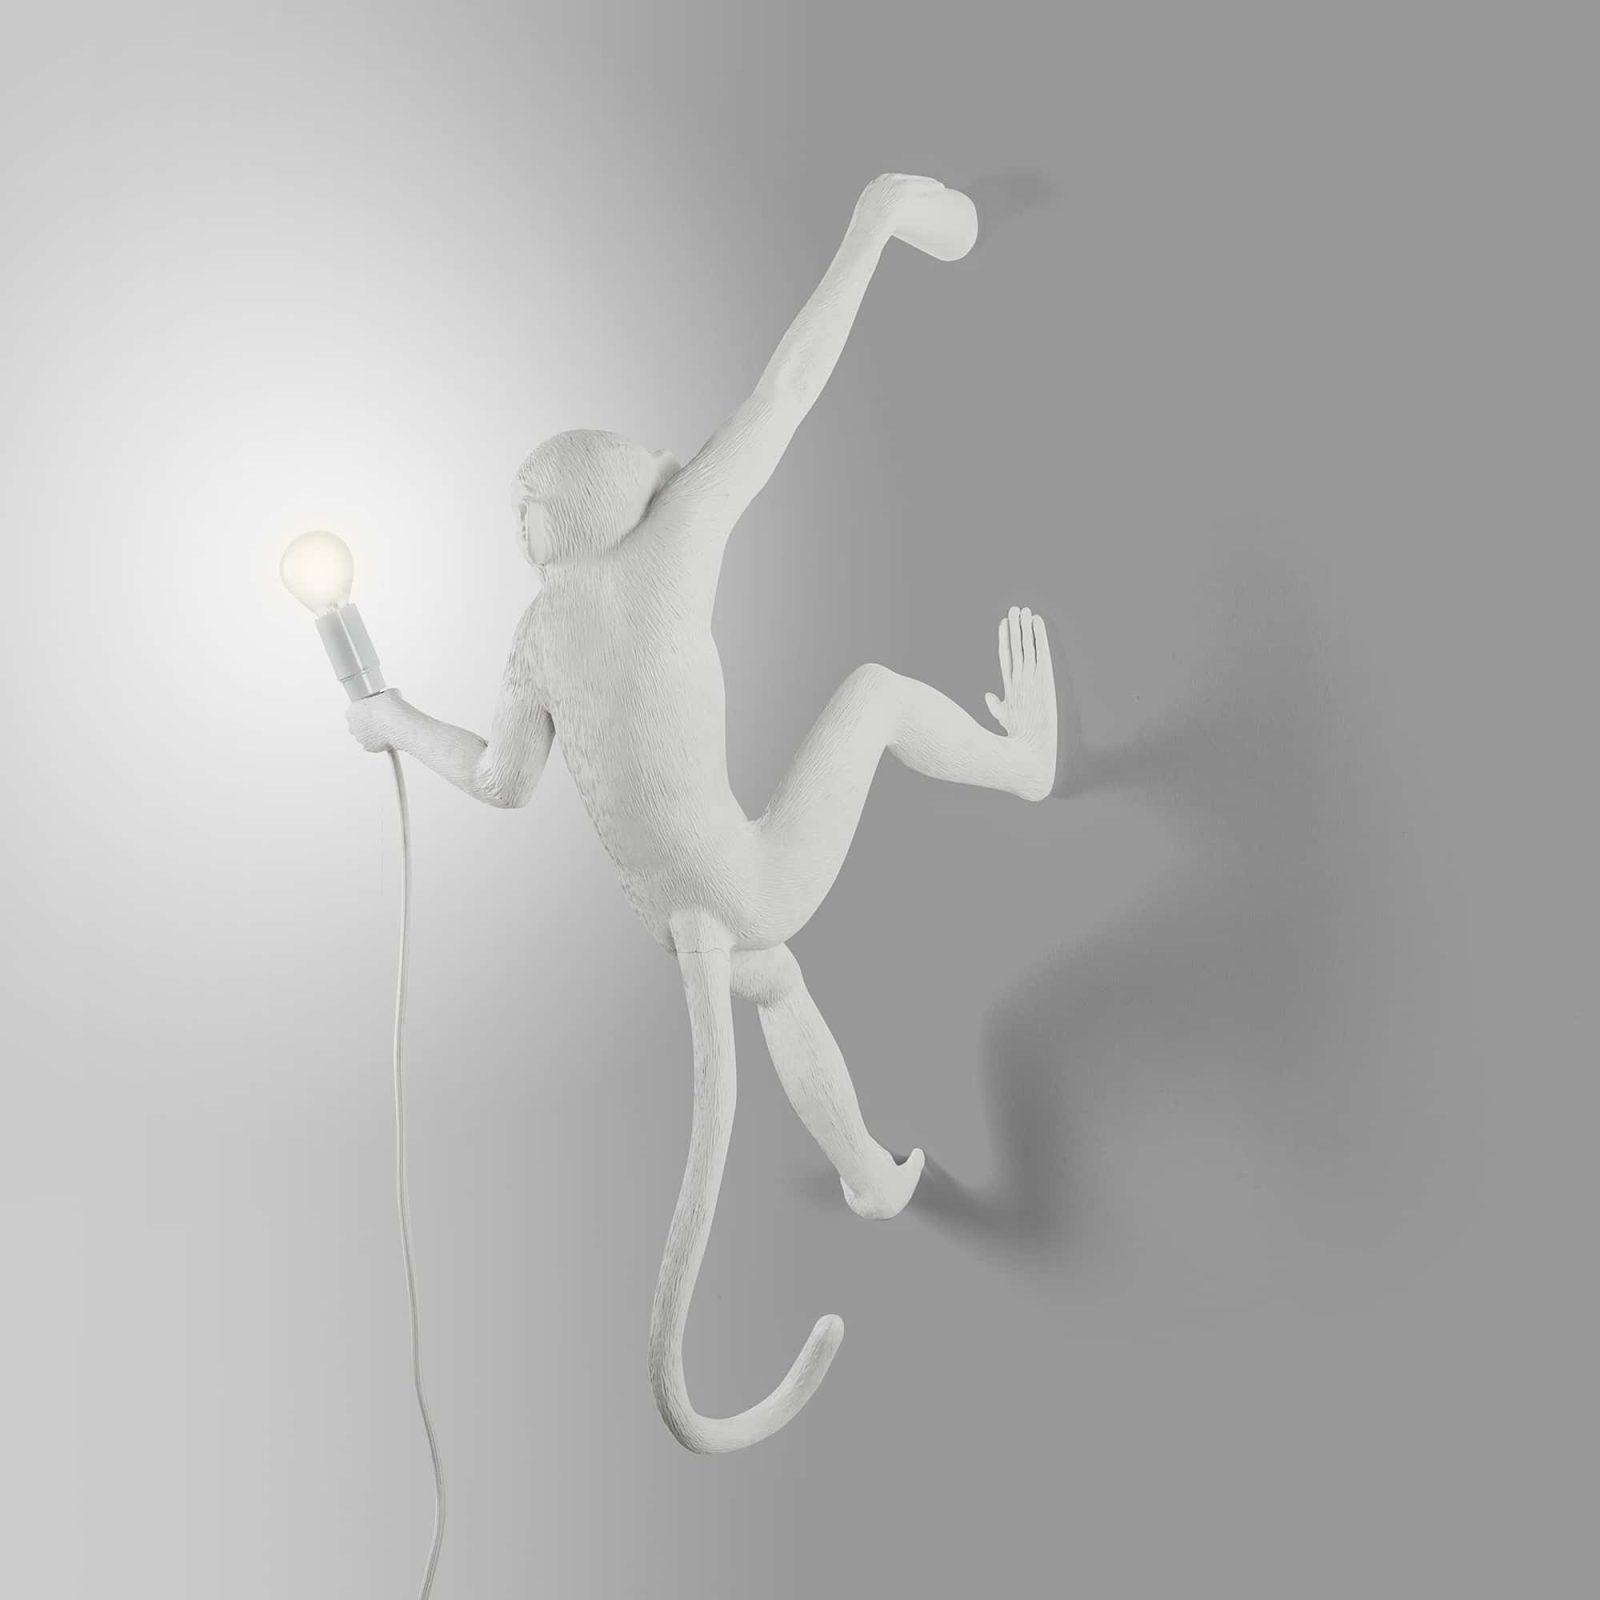 seletti-monkey-lamp-hanging-right-2